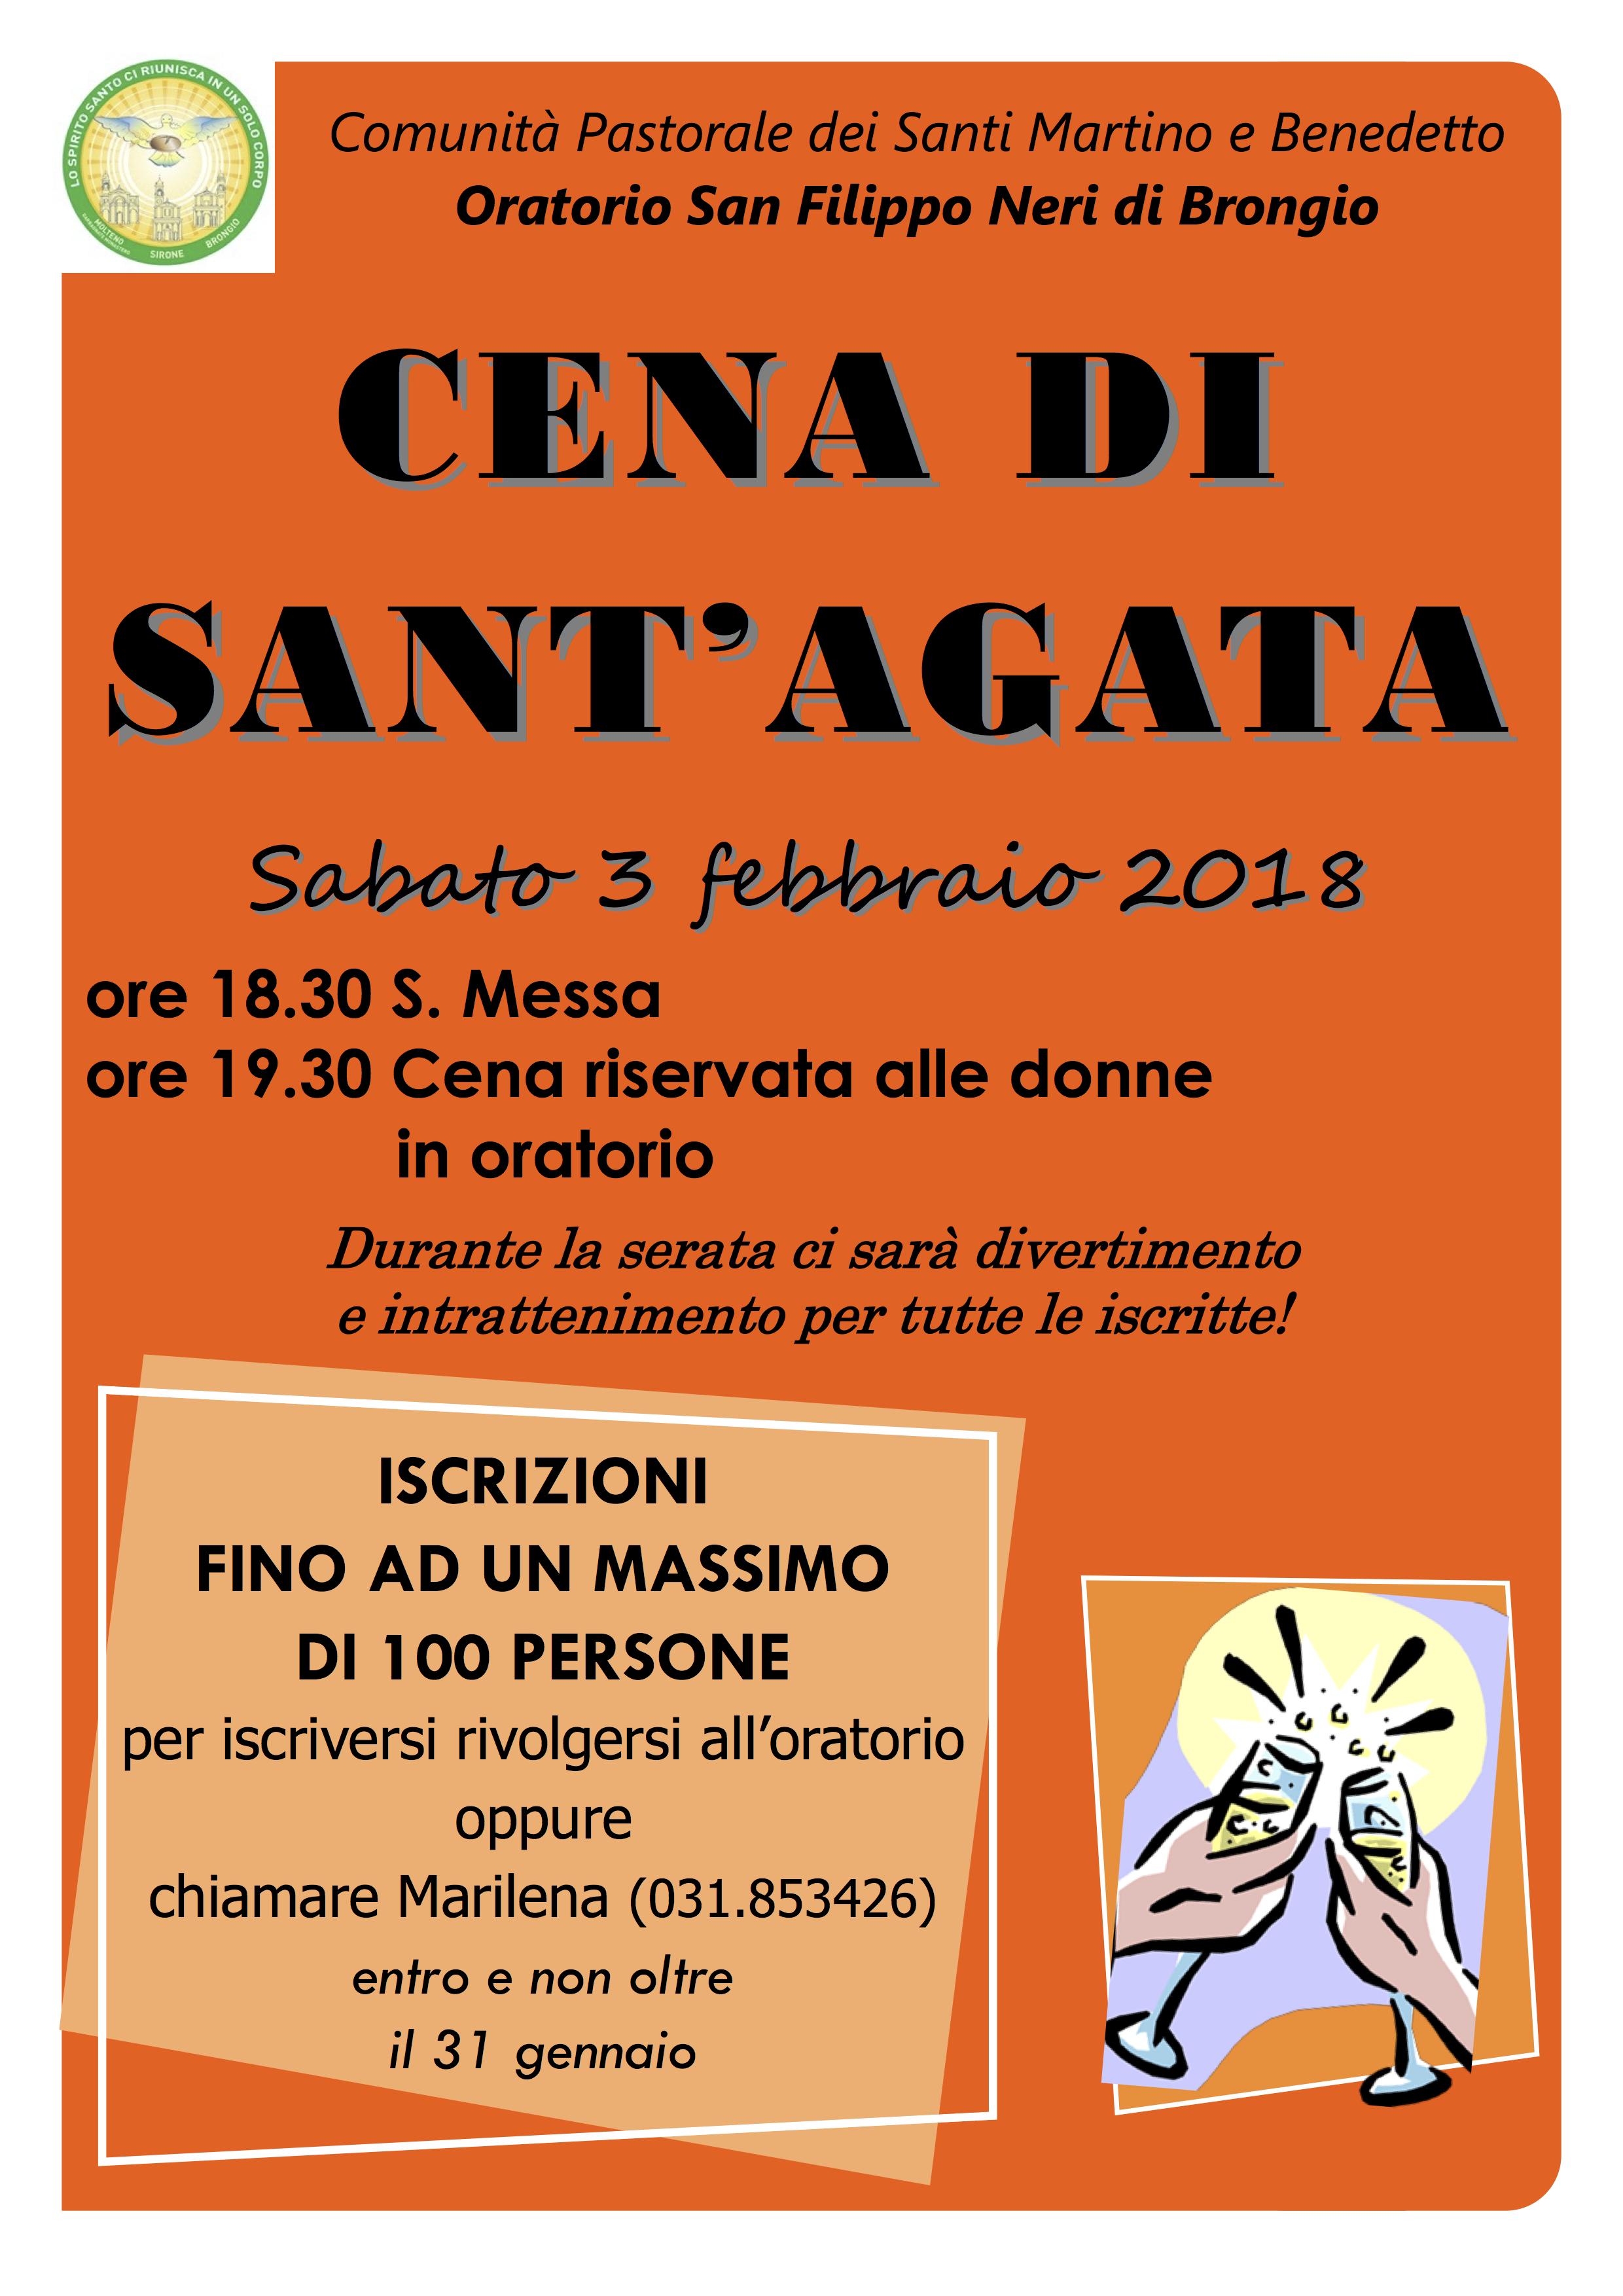 2018-sant-agata.png